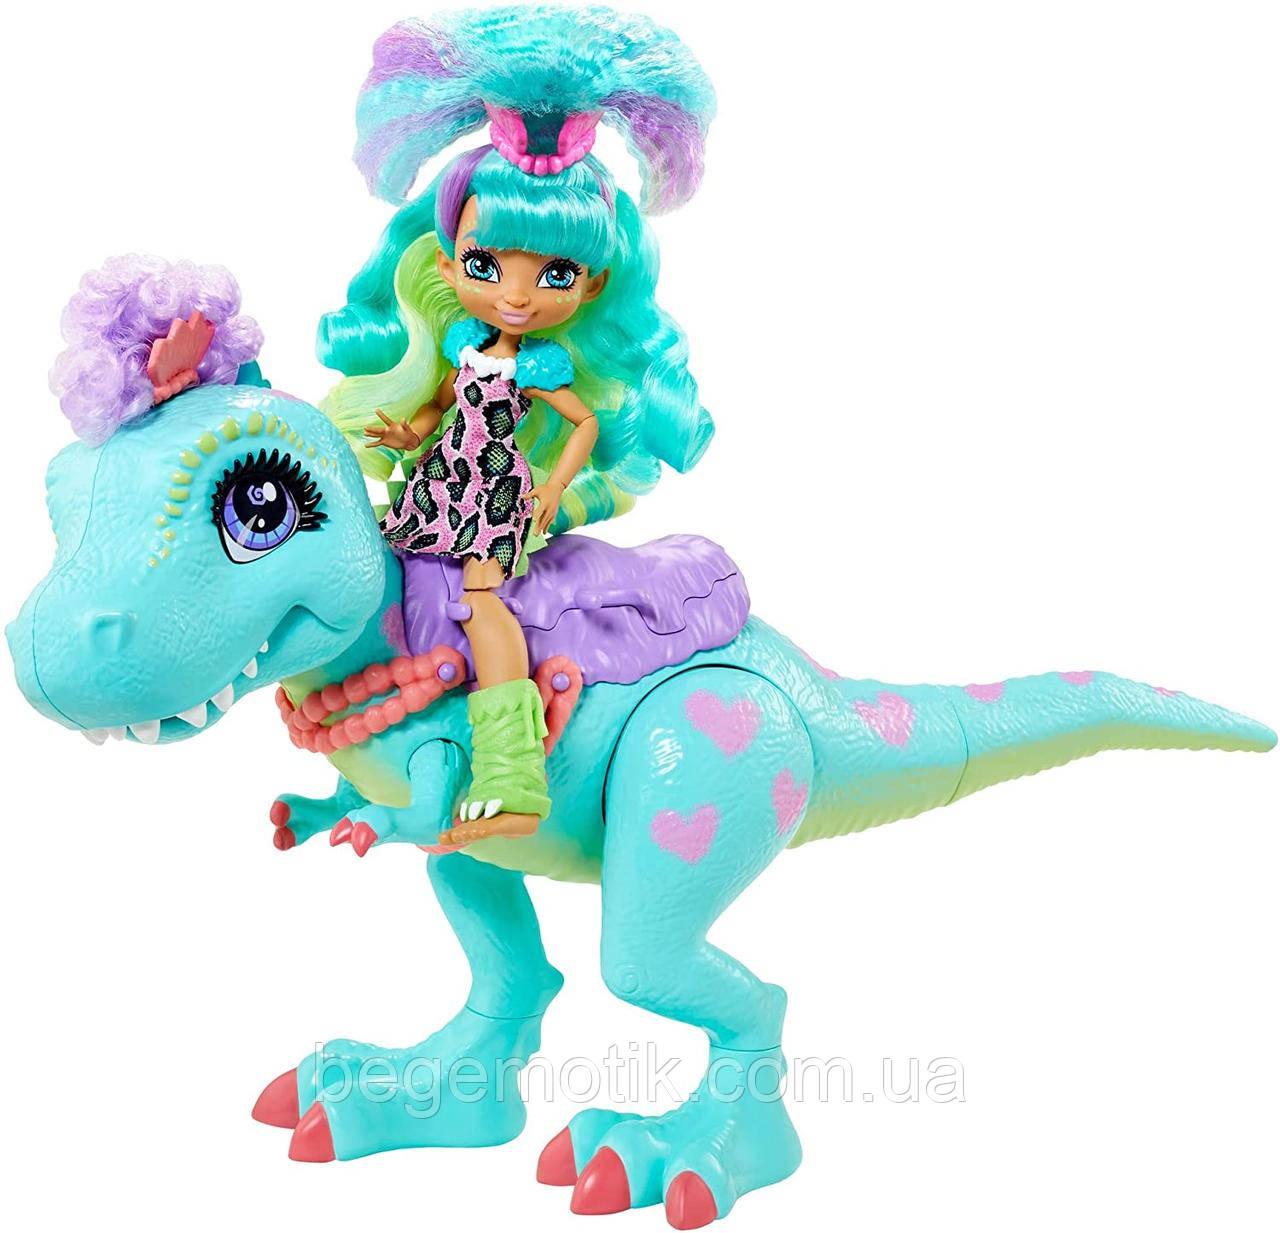 Cave Club Прогулка с динозавром кукла Рокелл и Тиразавр Mattel Cave Club Rockelle Doll and Tyrasaurus Dinosaur